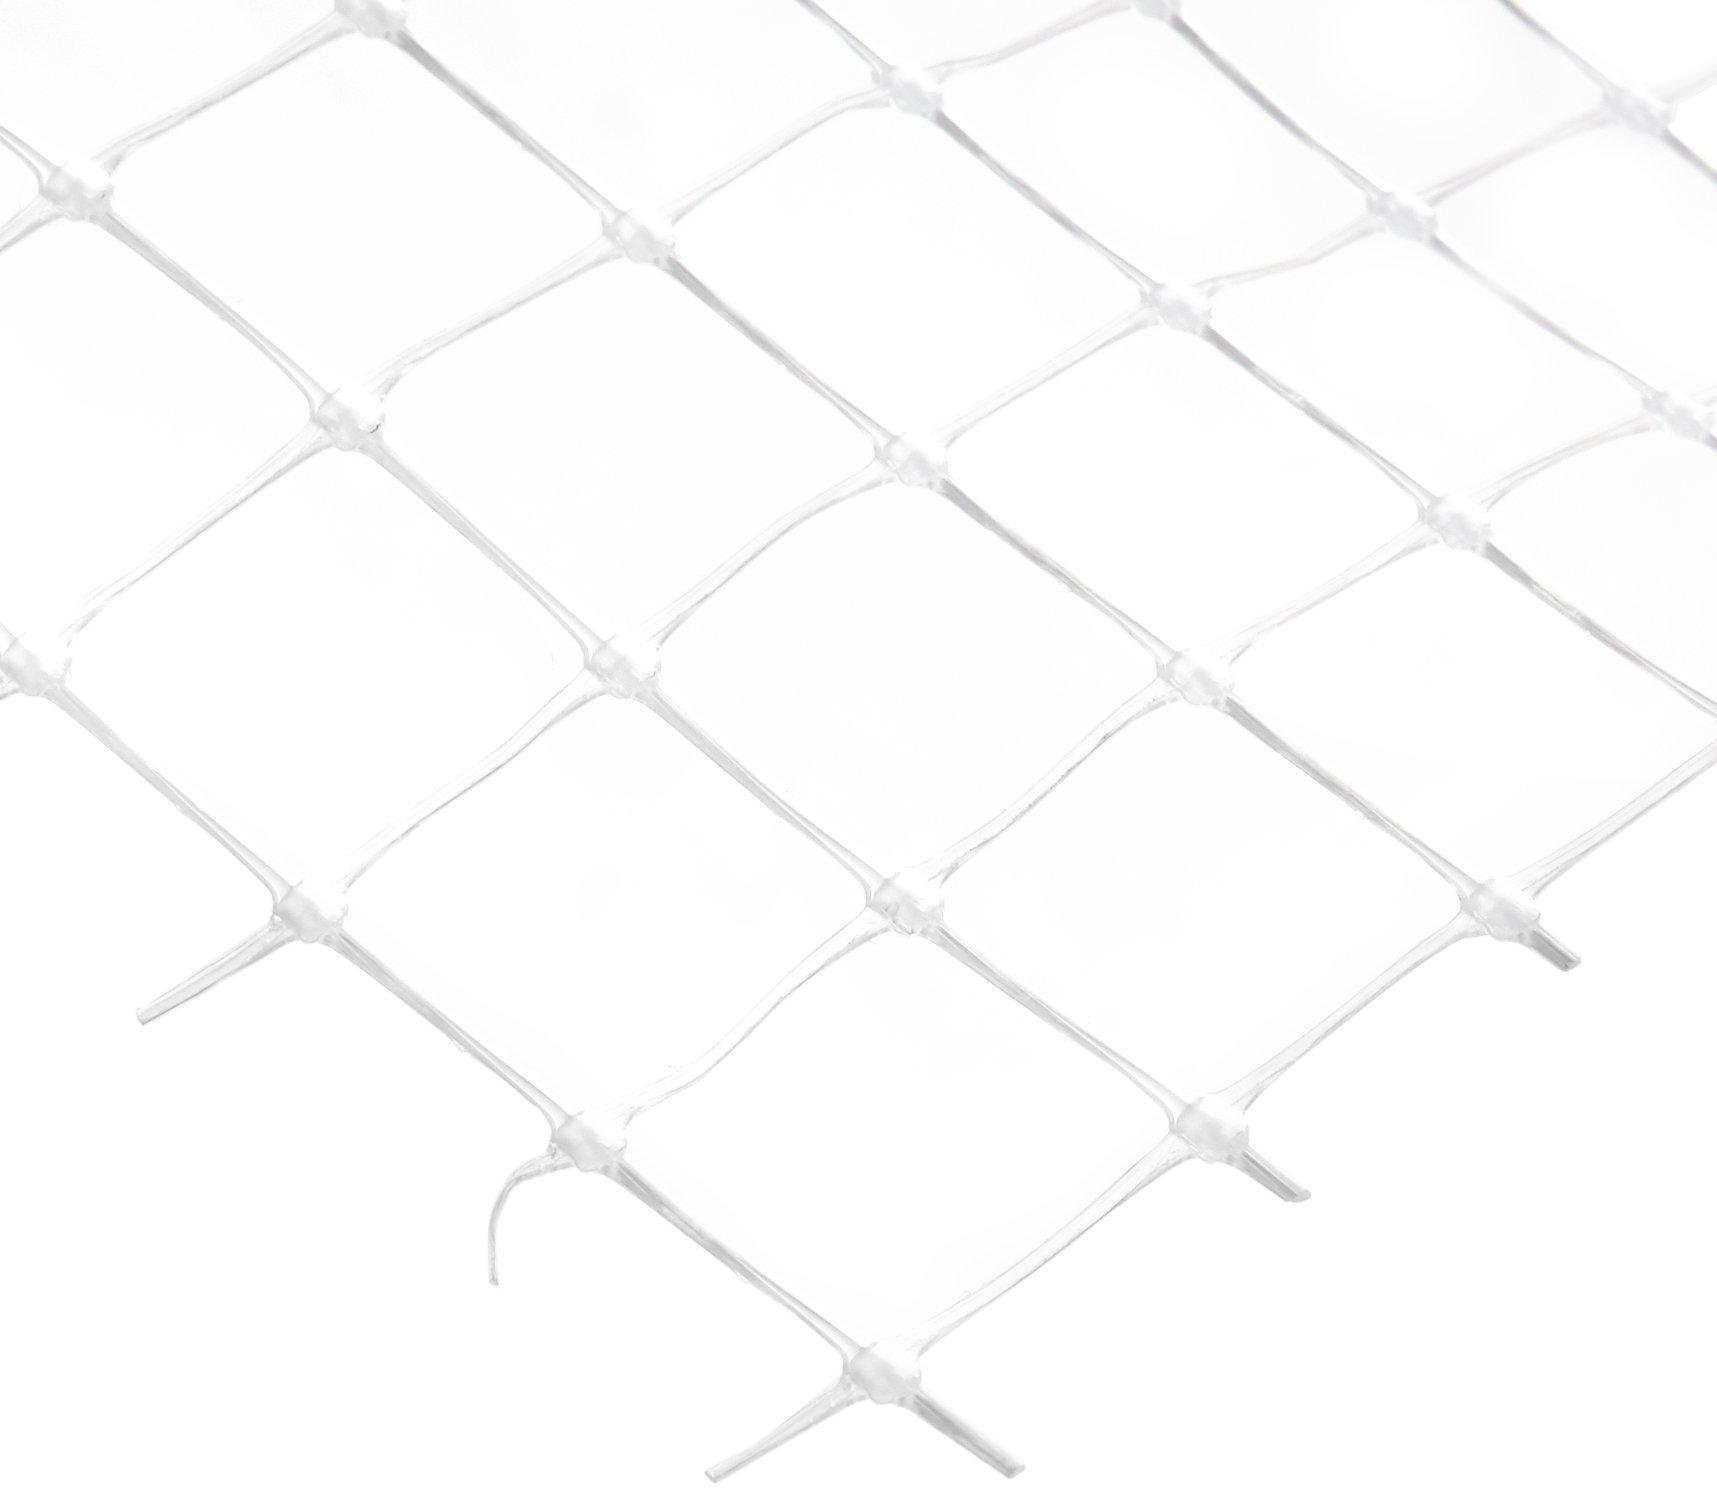 KidKusion Deck Guard, Clear